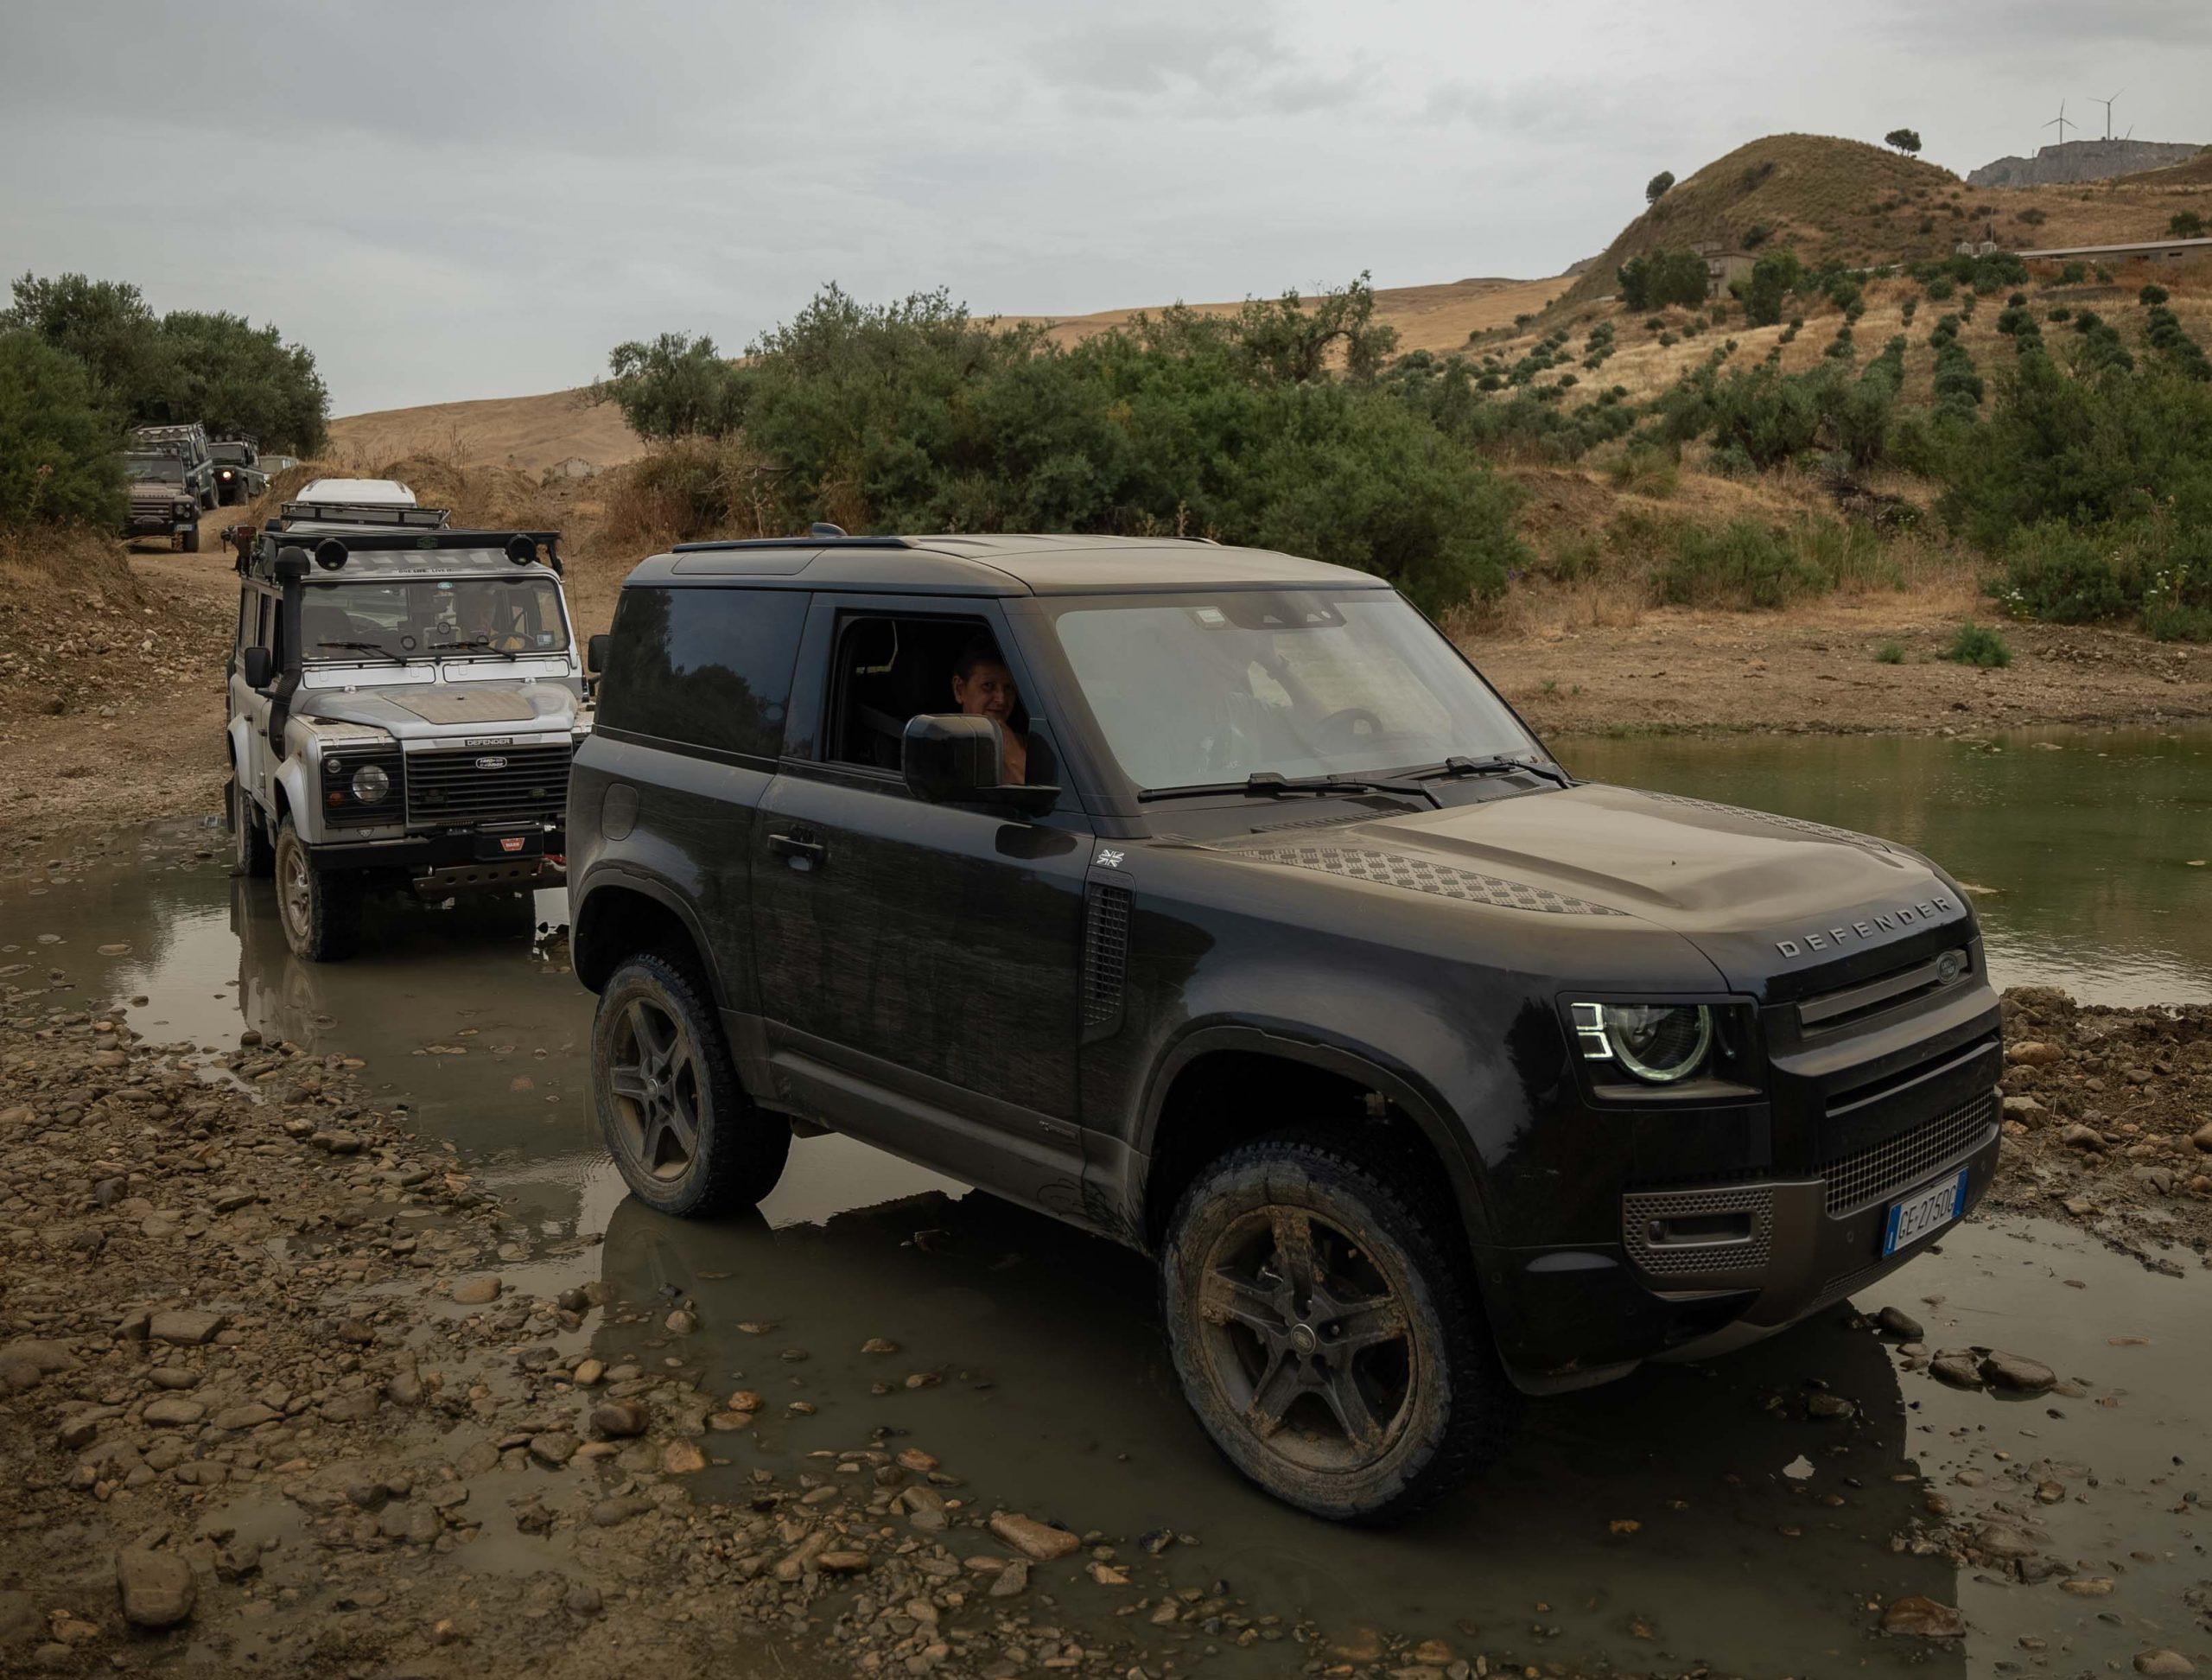 Land_Rover_Tour_Sicilia_2021_Land_Rover_Experience_Italia_-36